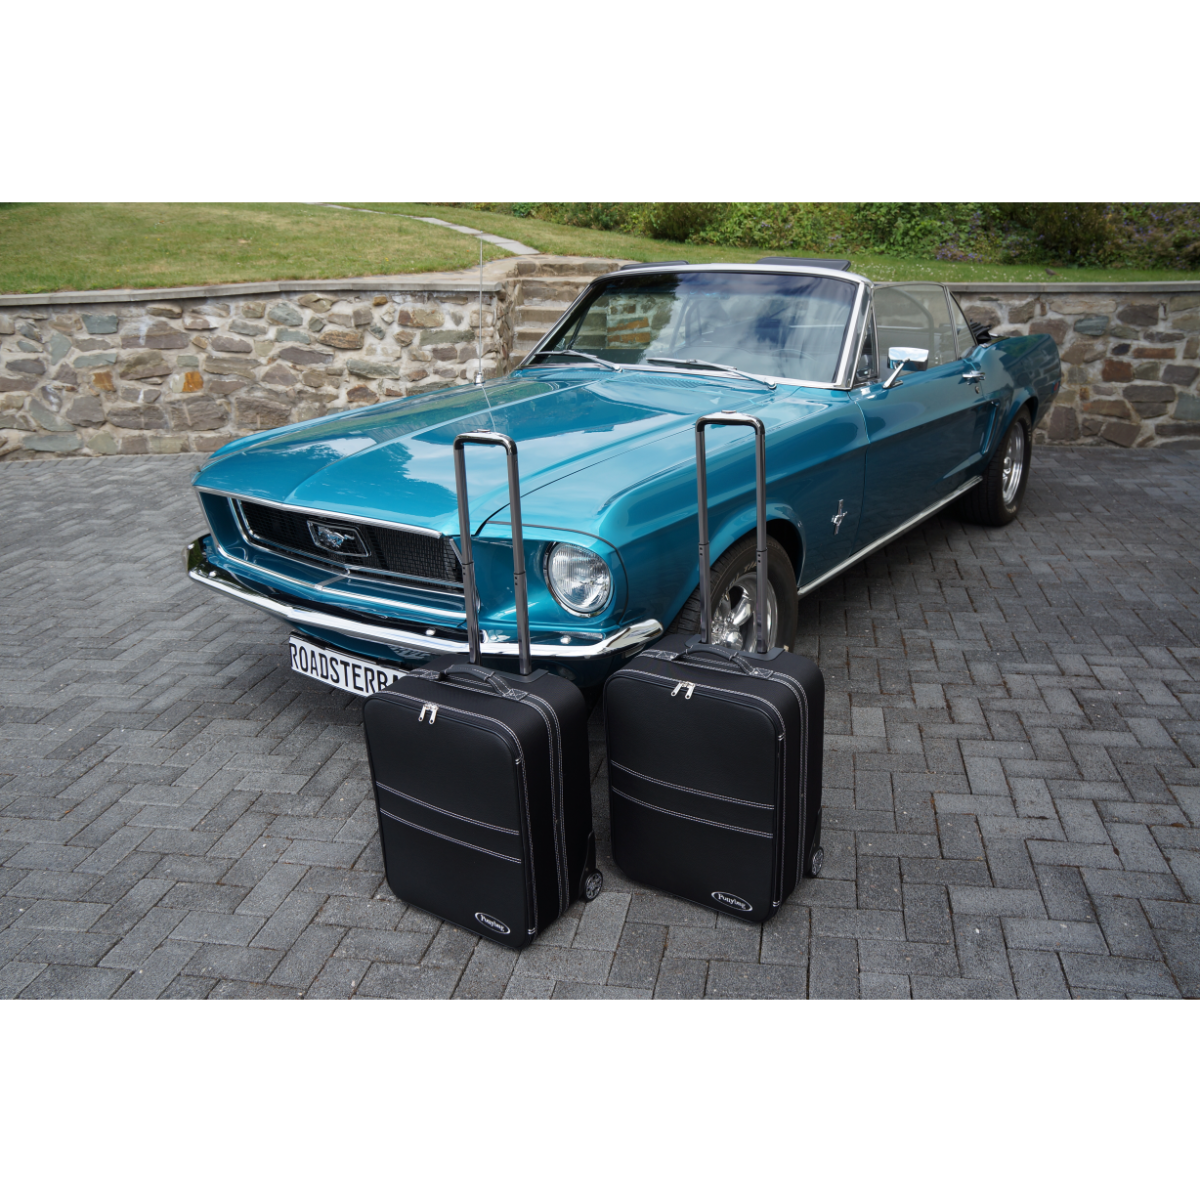 2-tlg. Kofferset mit 2 Rollen Ford Mustang 67/68